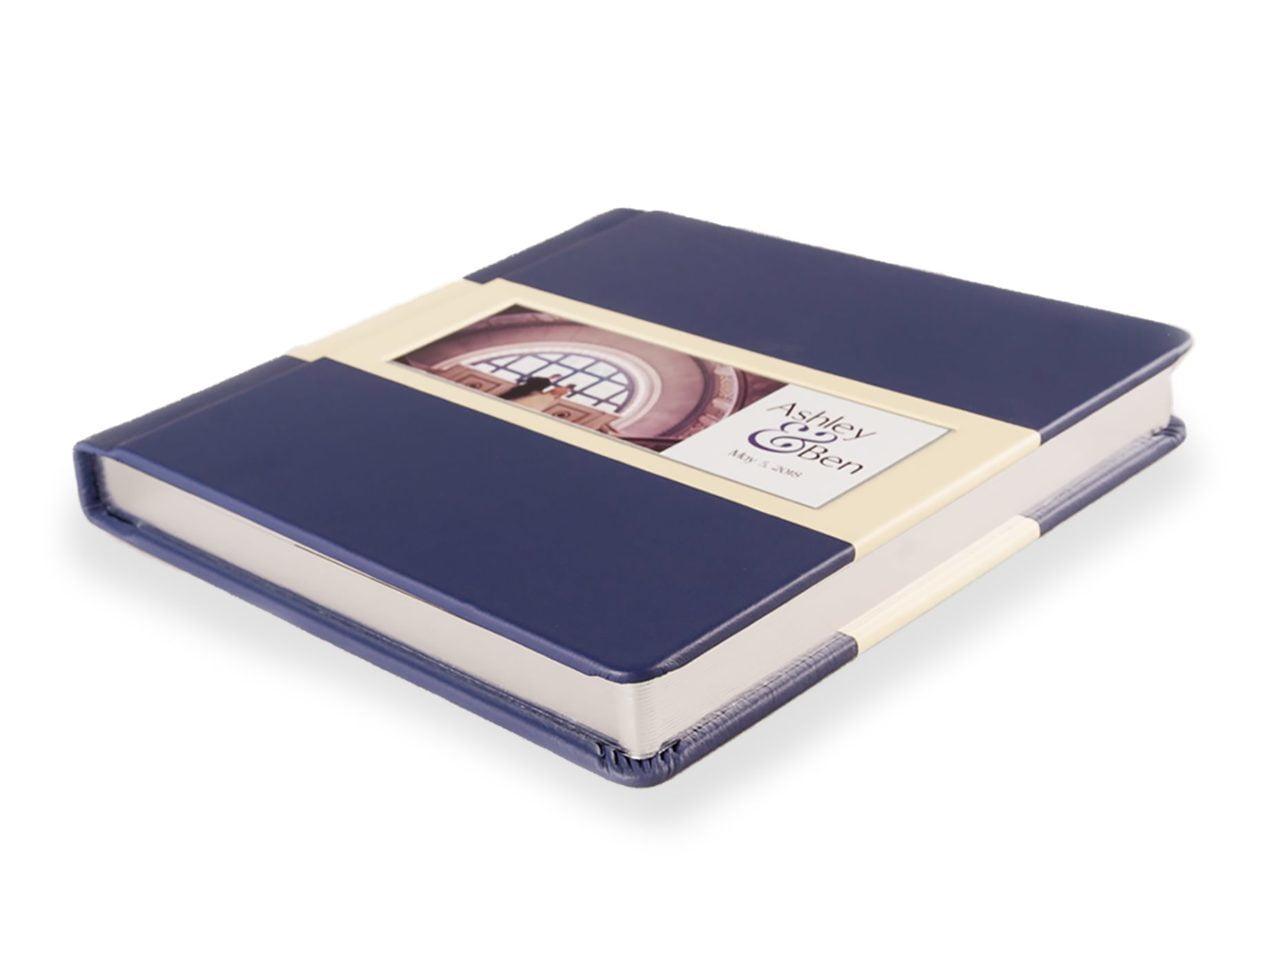 Zookbinders | Zook Book